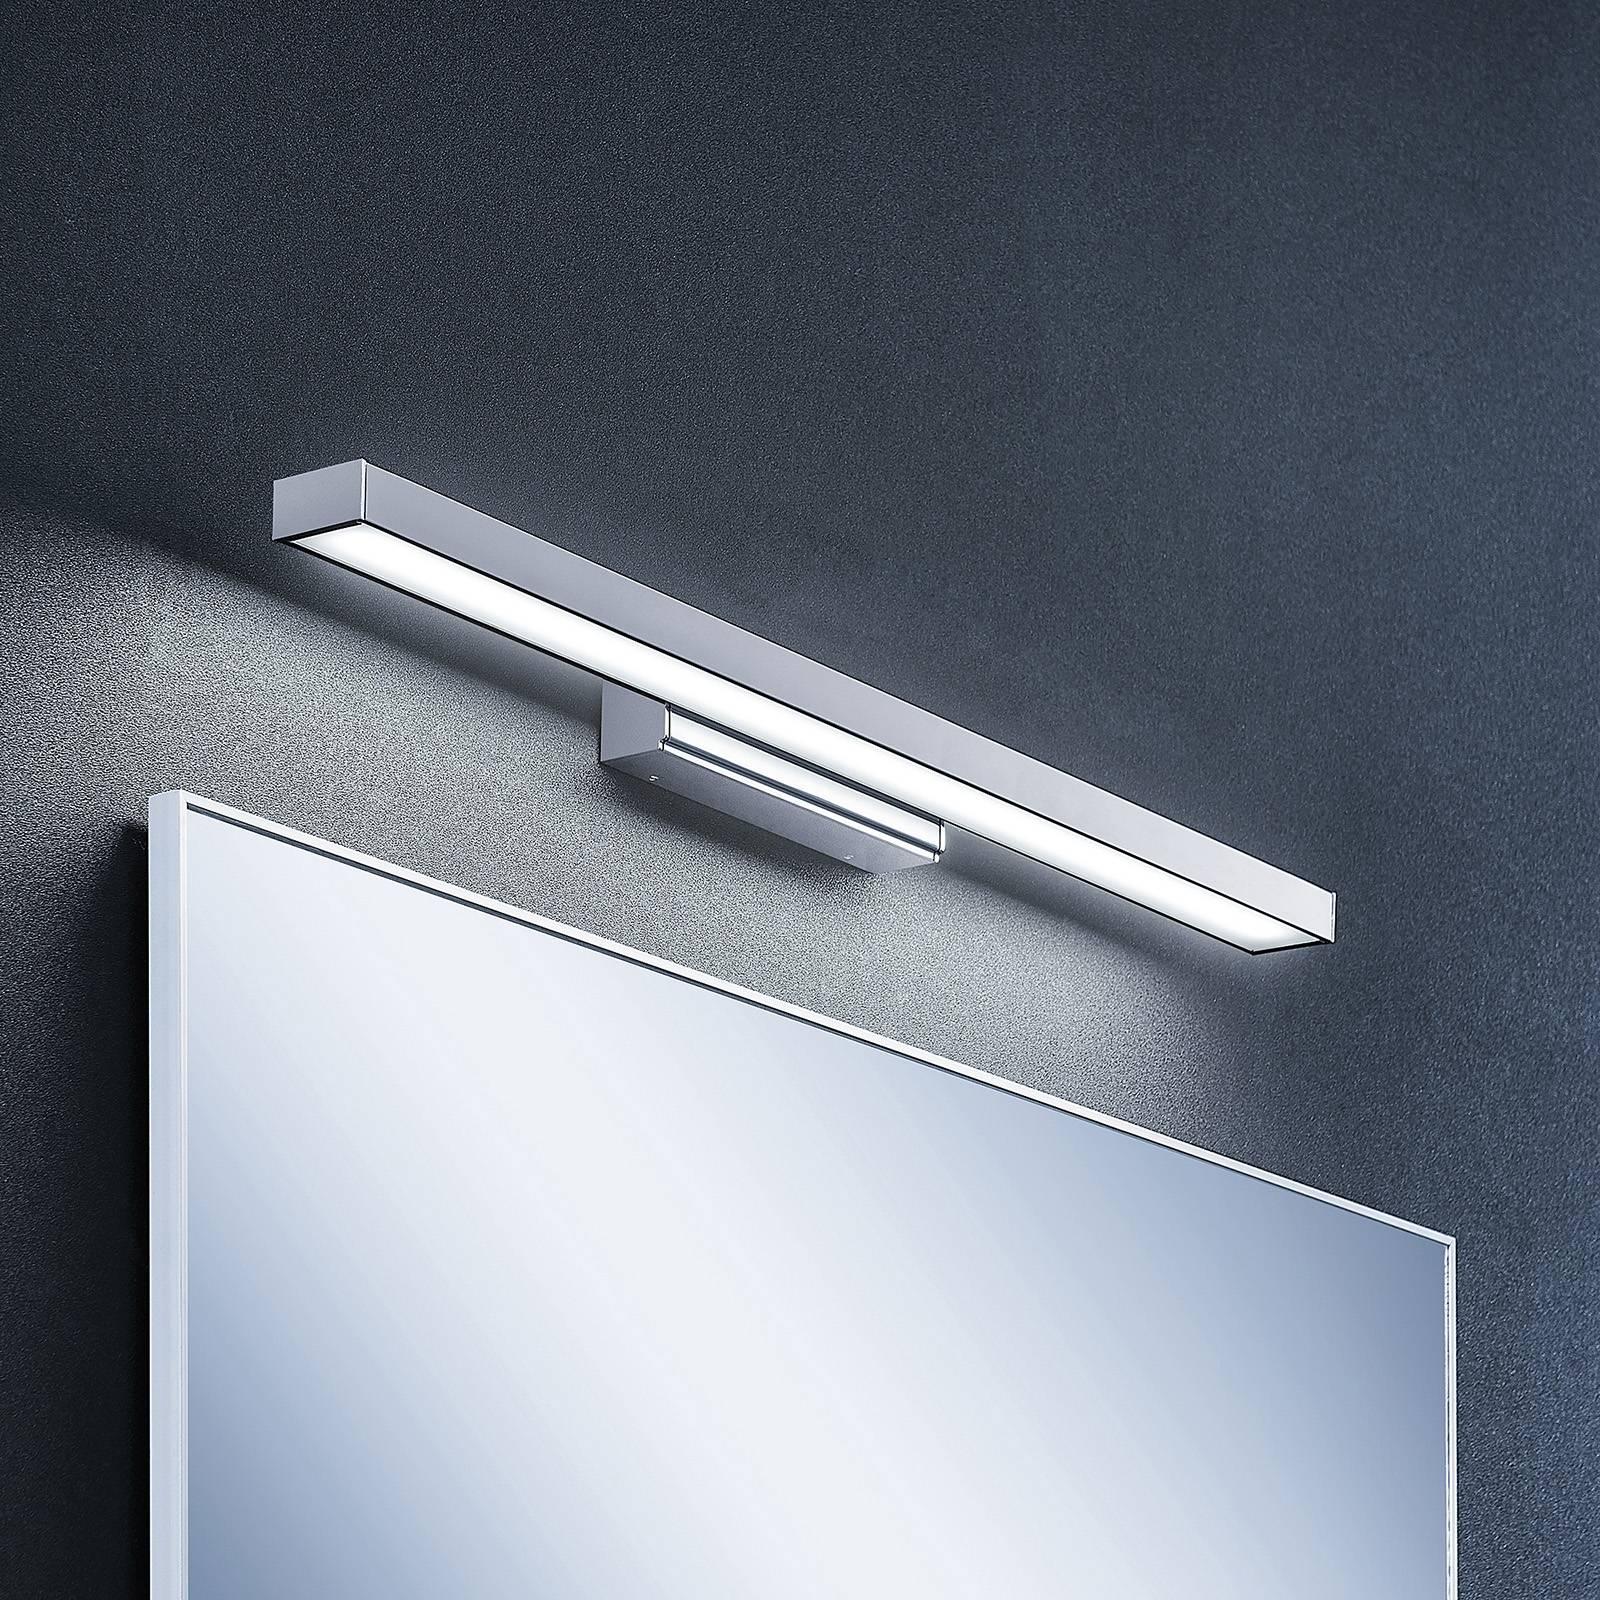 Lindby Alenia -kylpyhuoneen LED-peililamppu, 60 cm